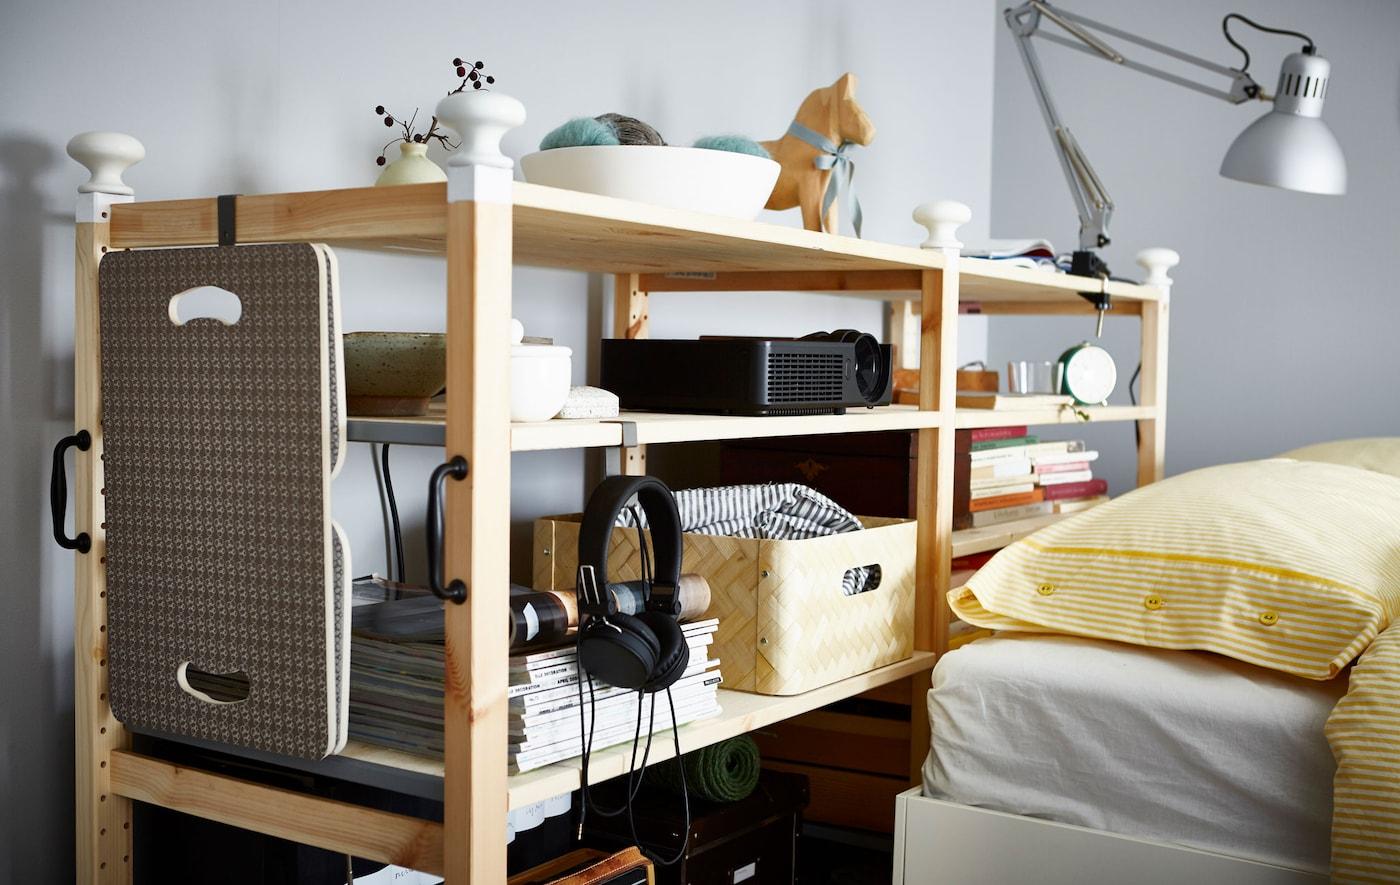 A customised IVAR shelving unit nestled behind a bed.